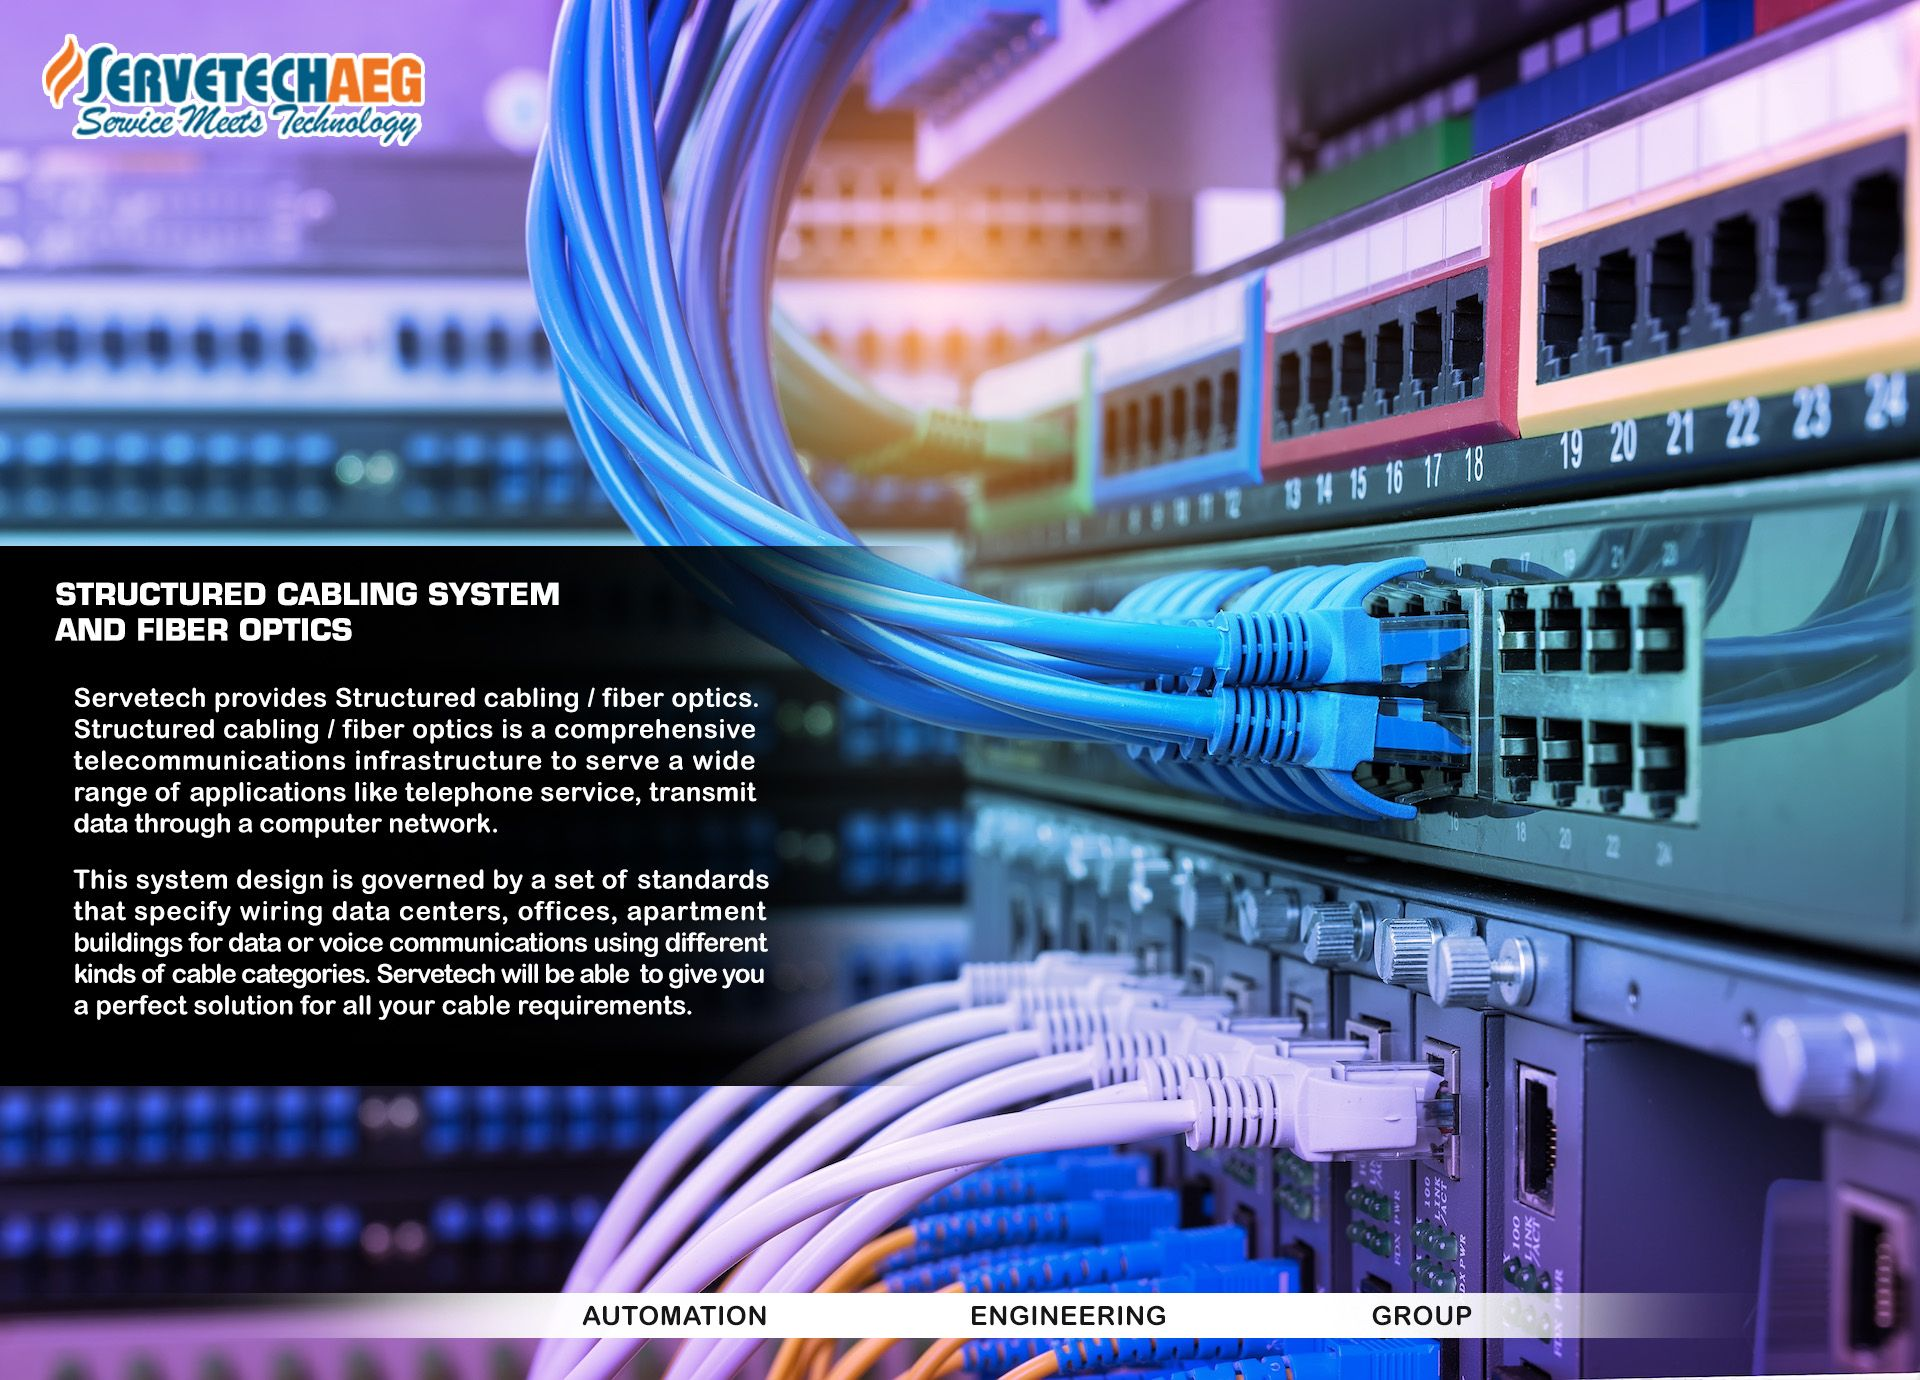 Structured Cabling System And Fiber Optics Servetech Provides Structured Cabling Fiber Optics Structured C Fiber Optic Network Monitor Cctv Security Cameras